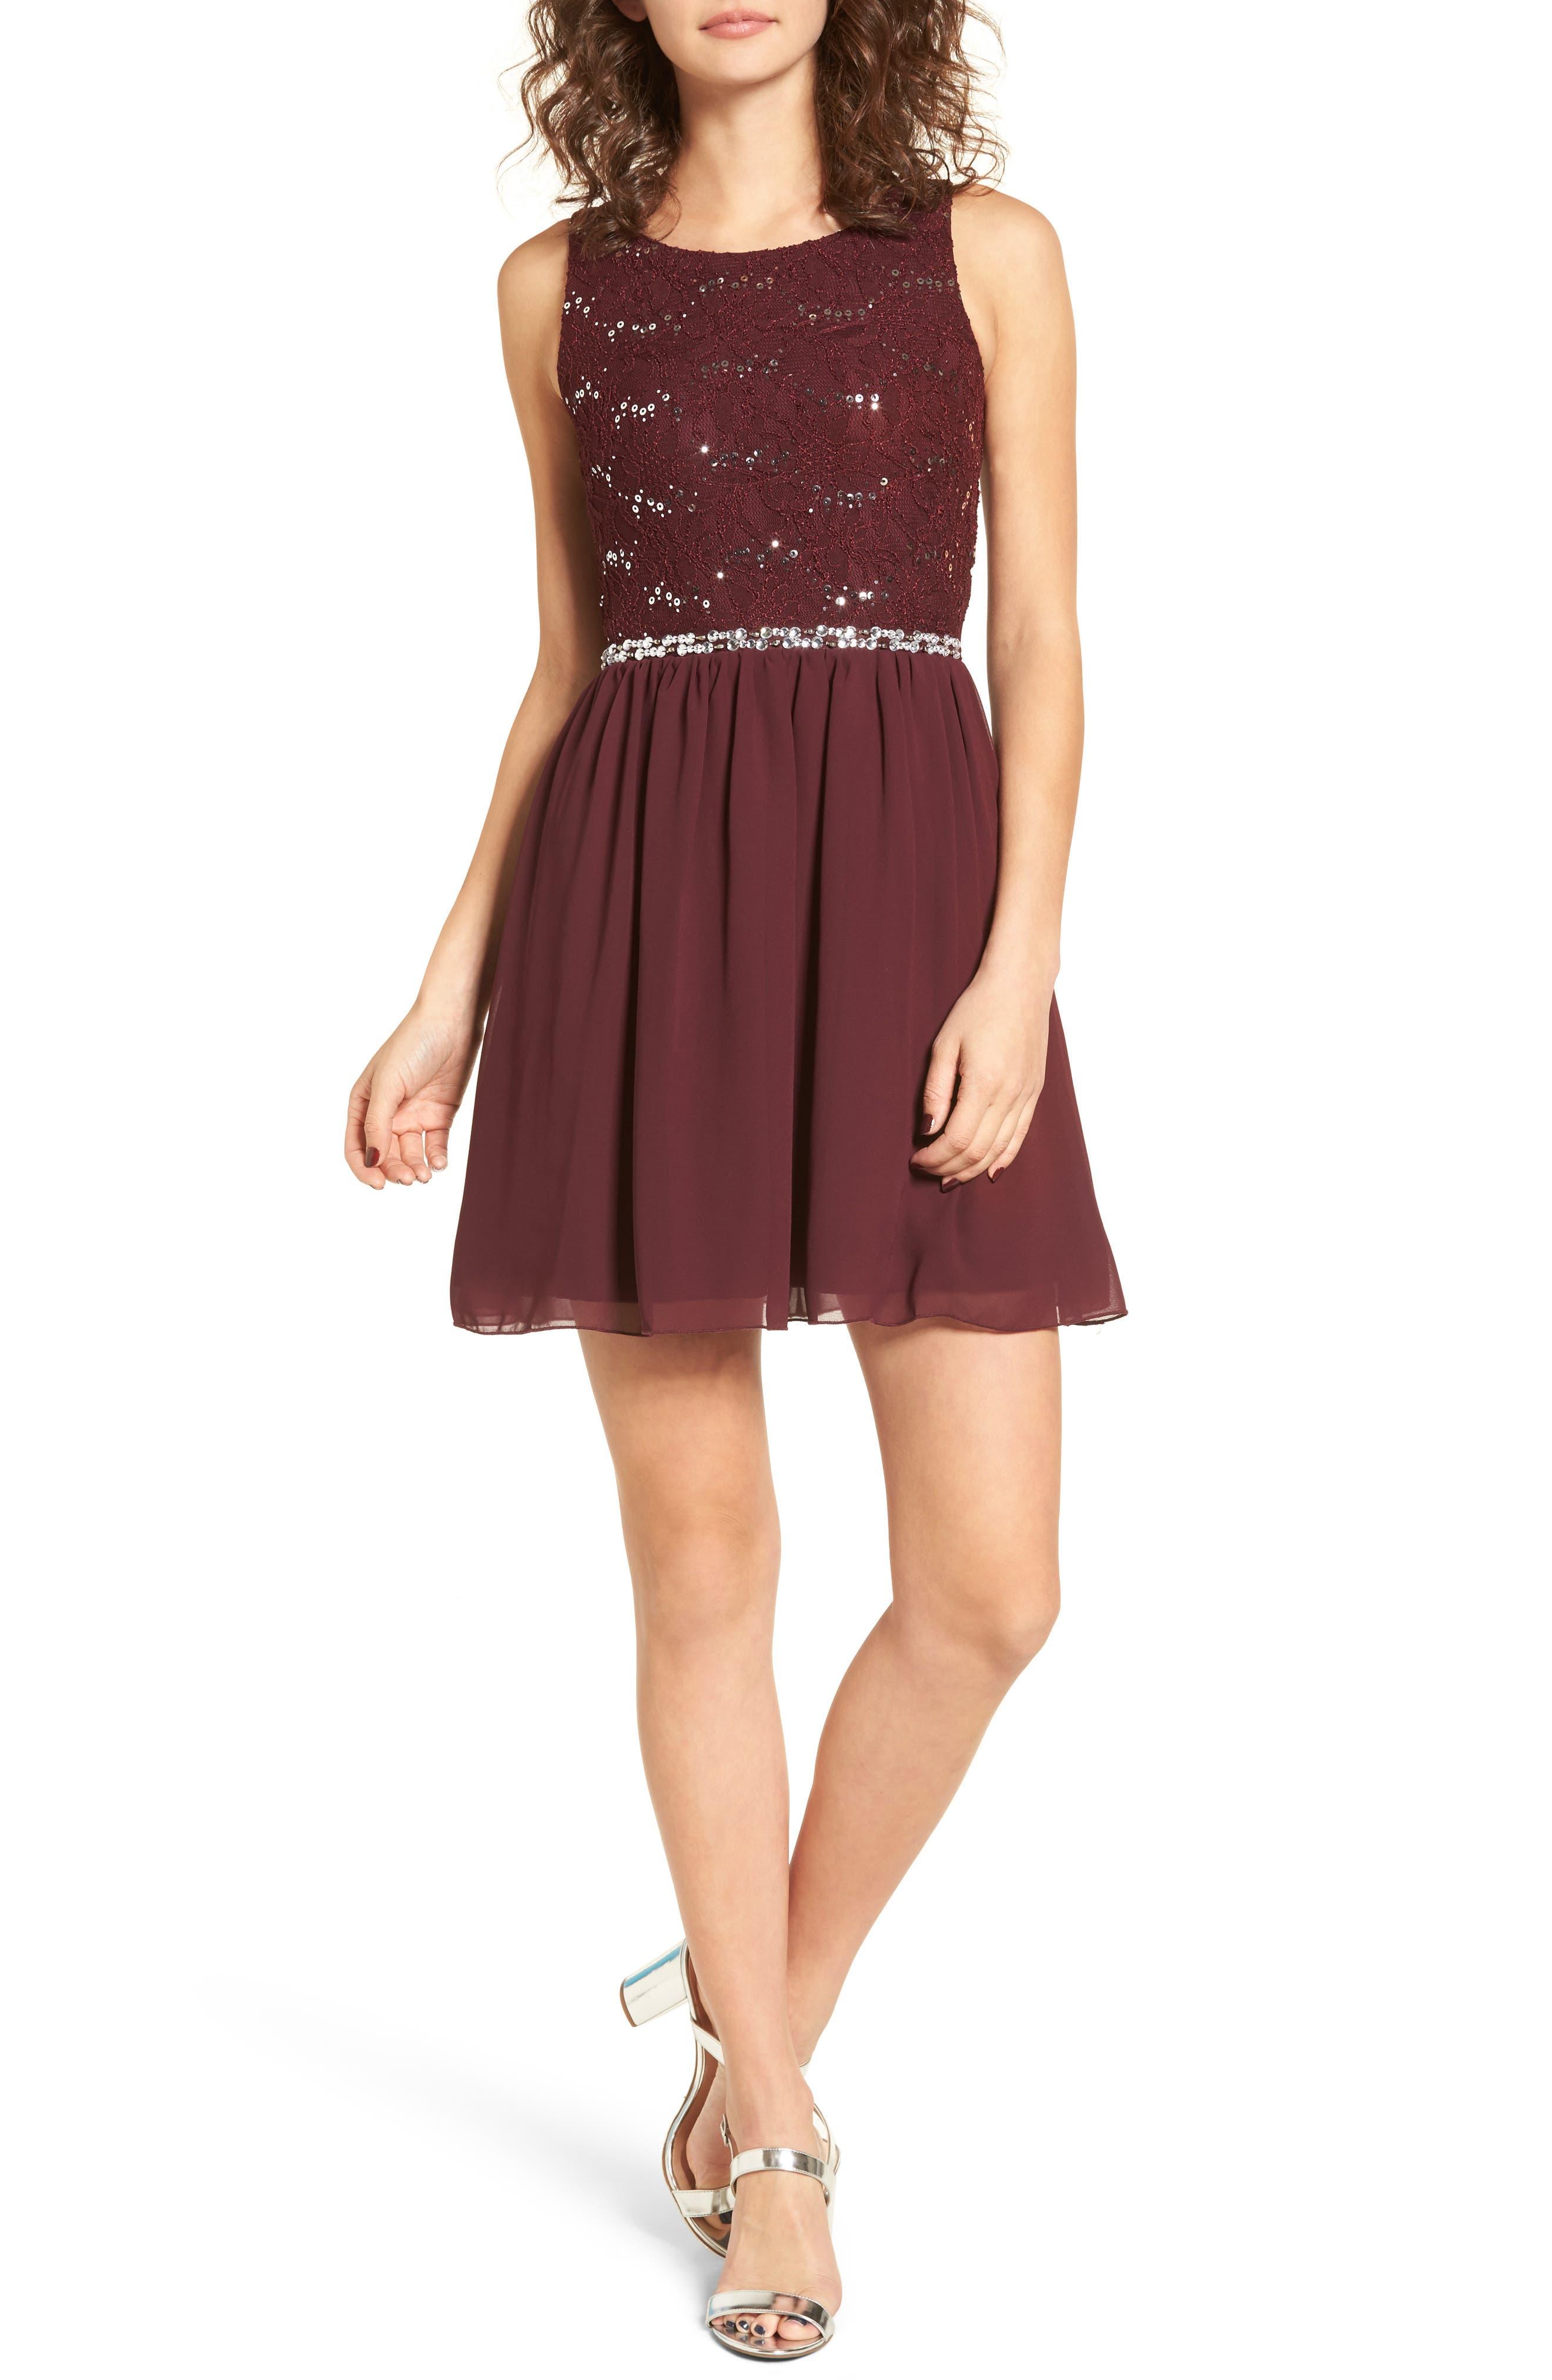 Main Image - Speechless Jeweled Belt Dress